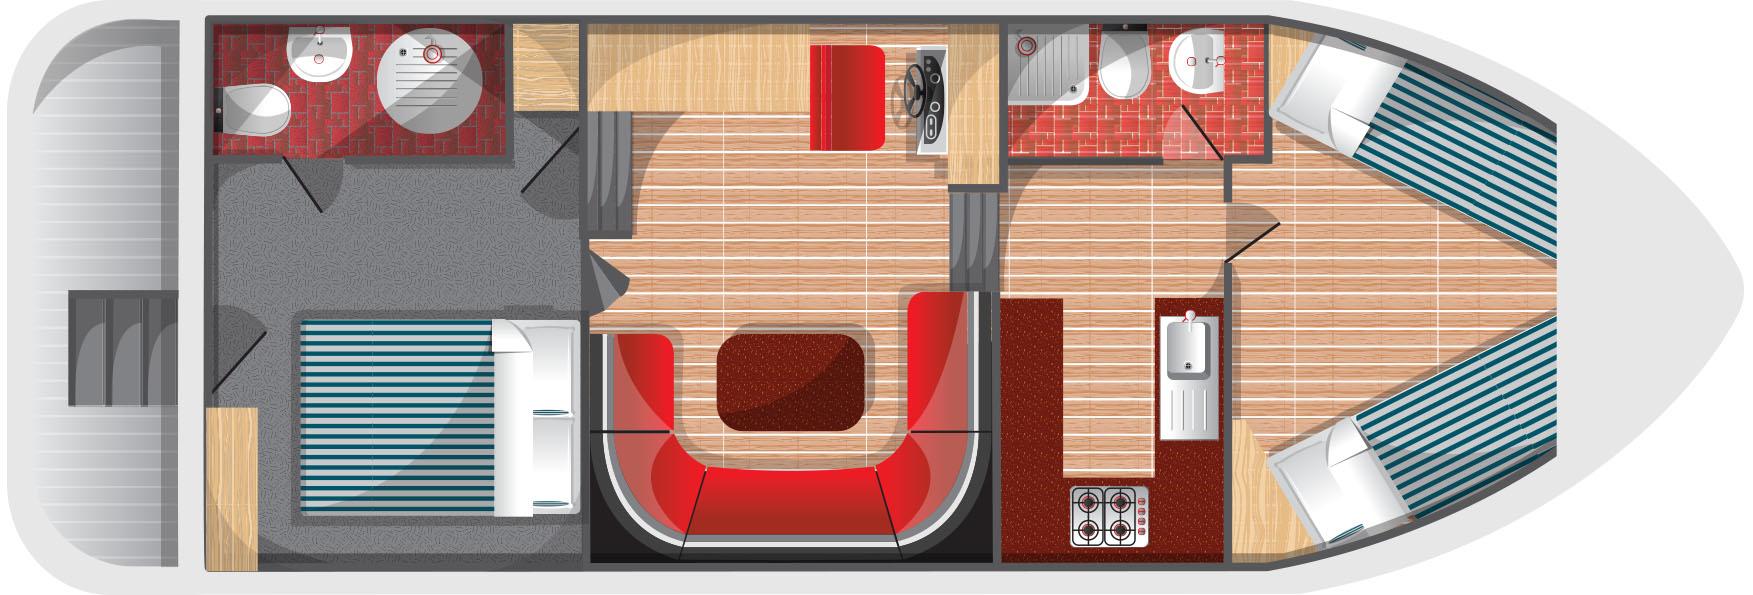 Floorplan for Fair Royale